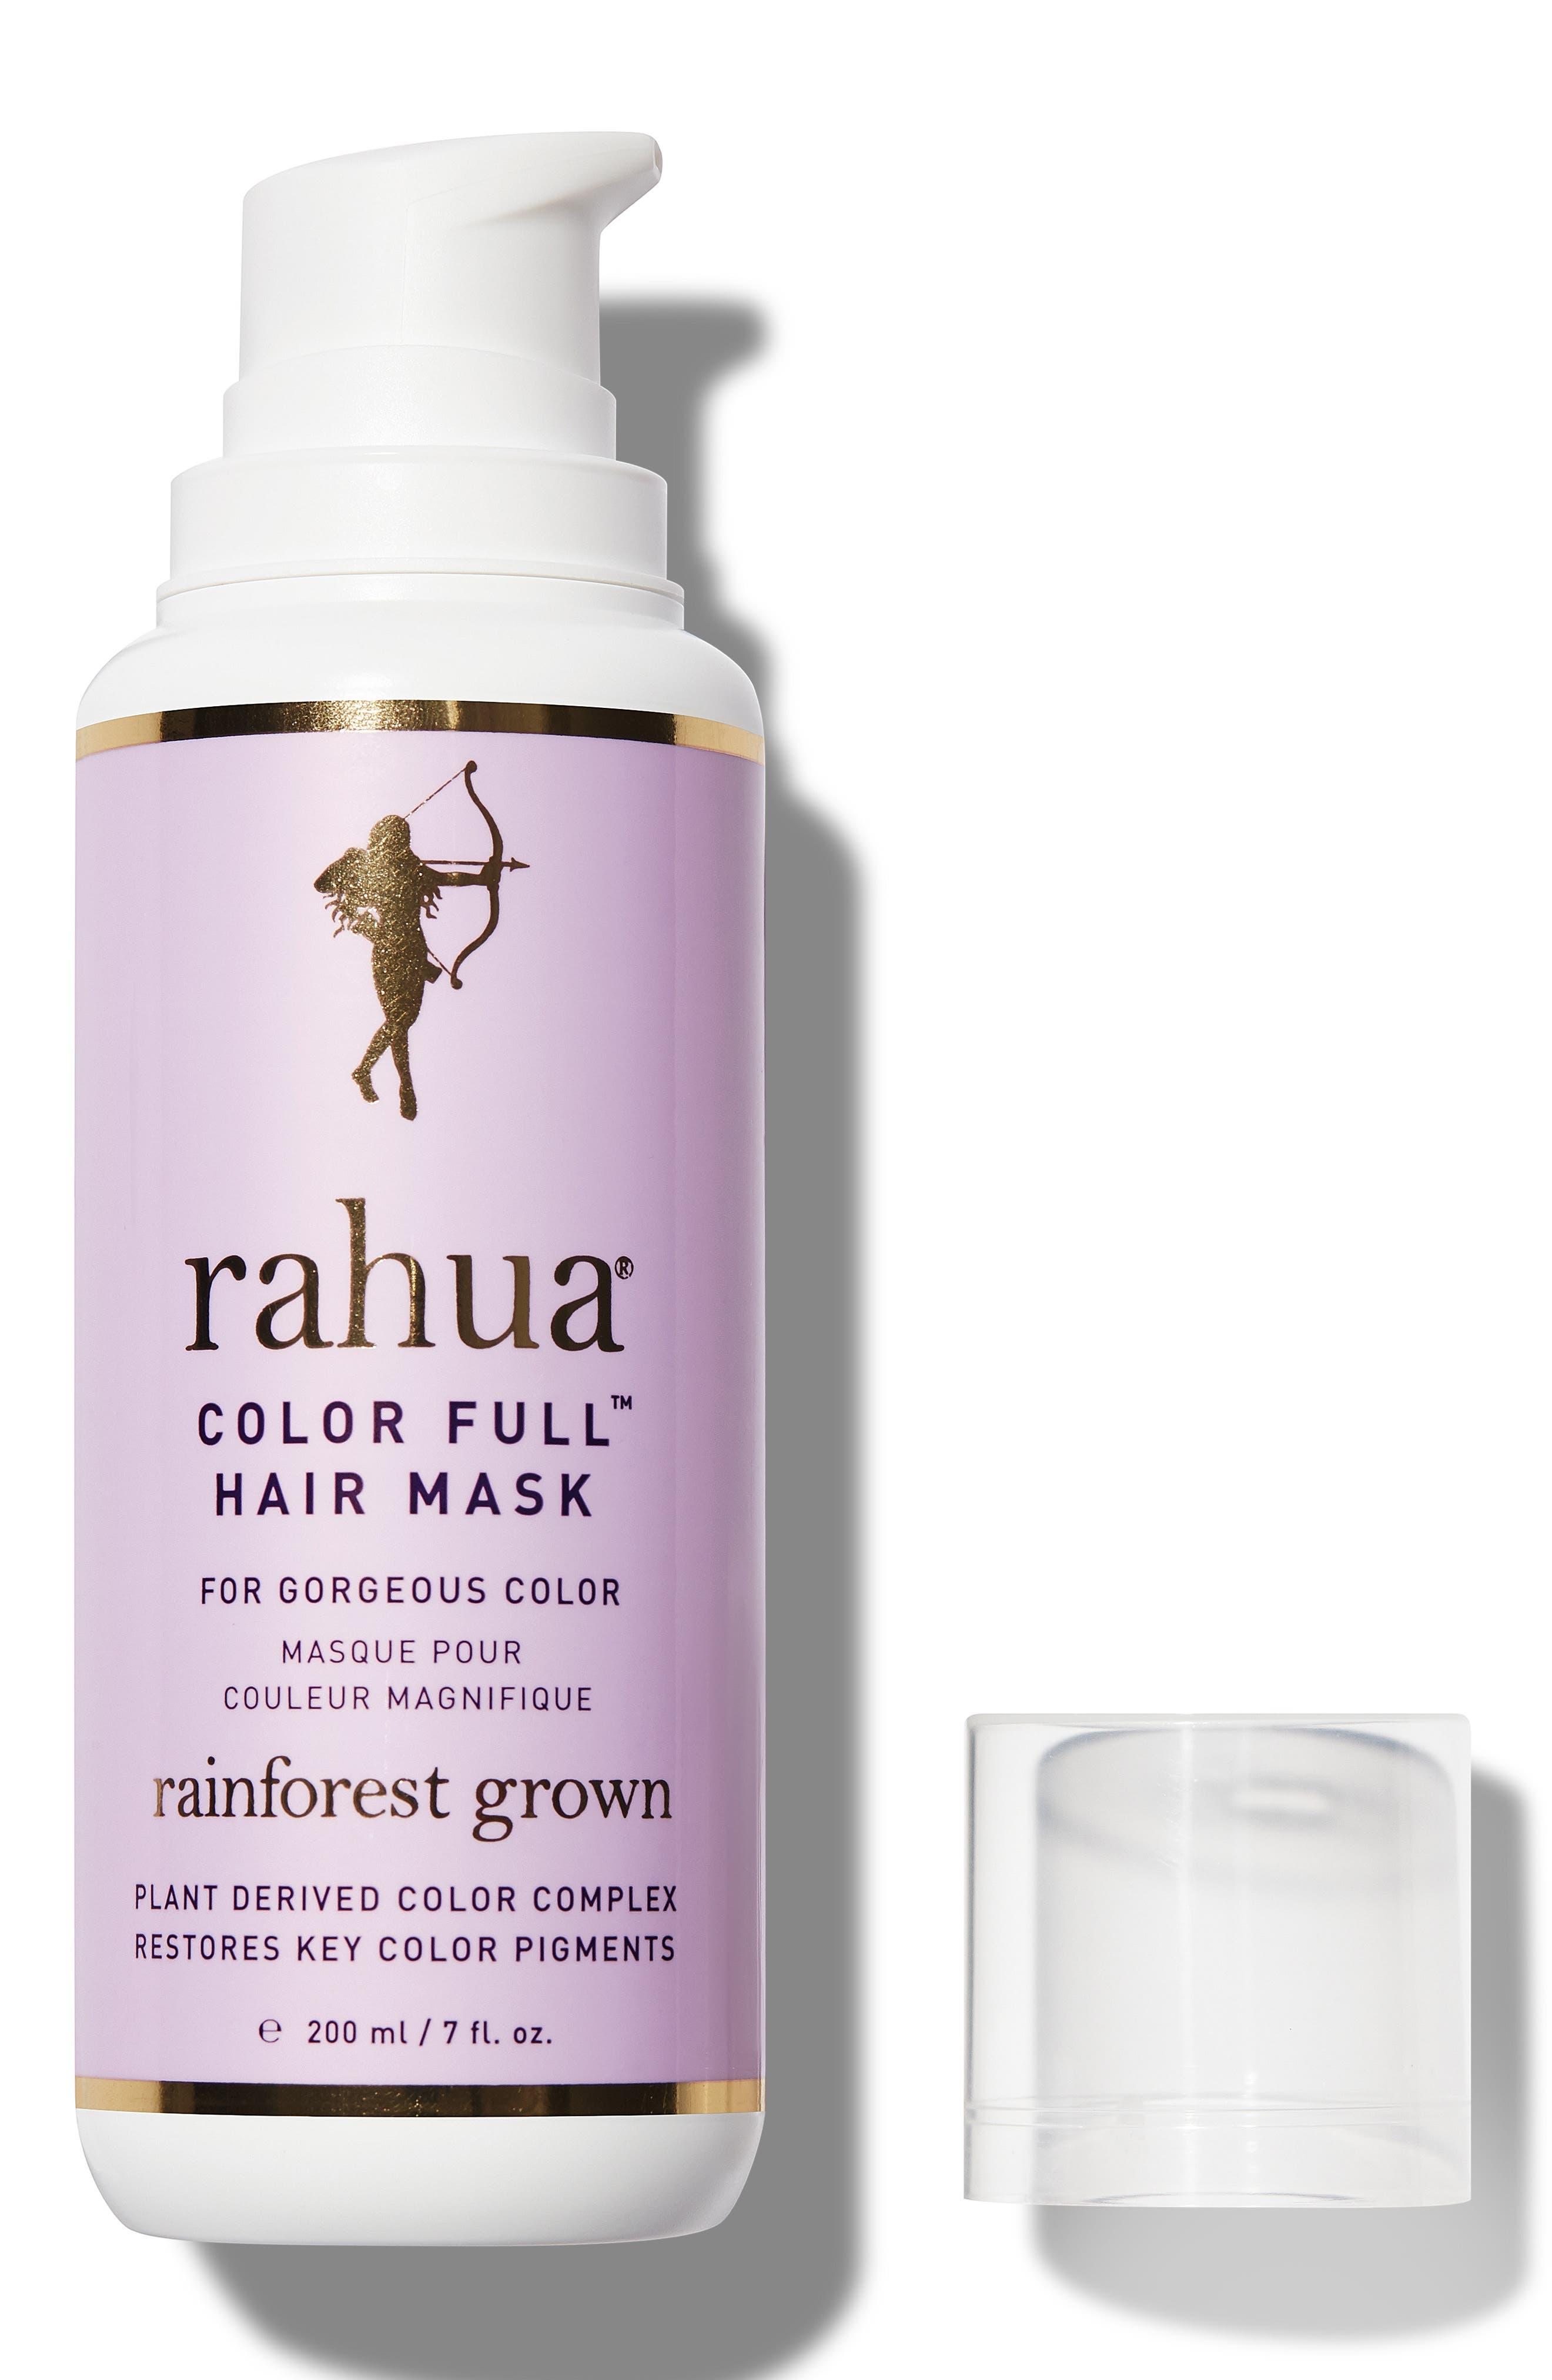 RAHUA<SUP>®</SUP>,                             SPACE.NK.apothecary rahua<sup>®</sup> Color Full<sup>™</sup> Hair Mask,                             Main thumbnail 1, color,                             NO COLOR